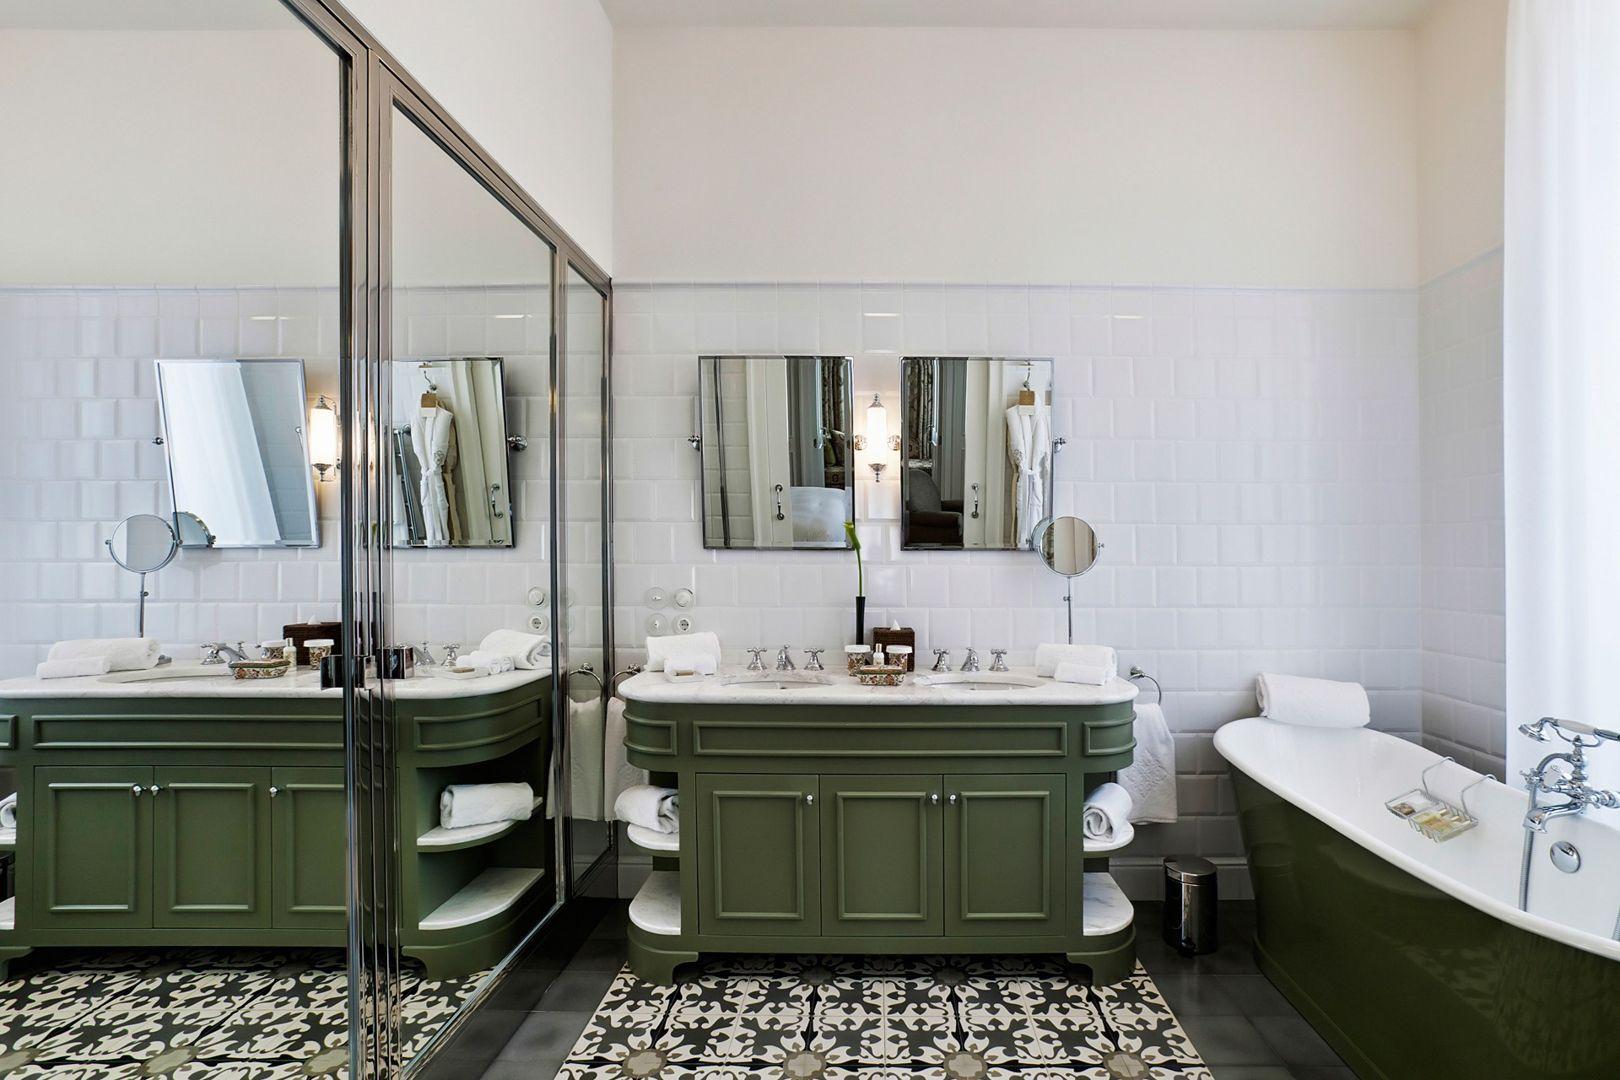 Bathroom ideas | Simple bathroom designs, Bathroom ...